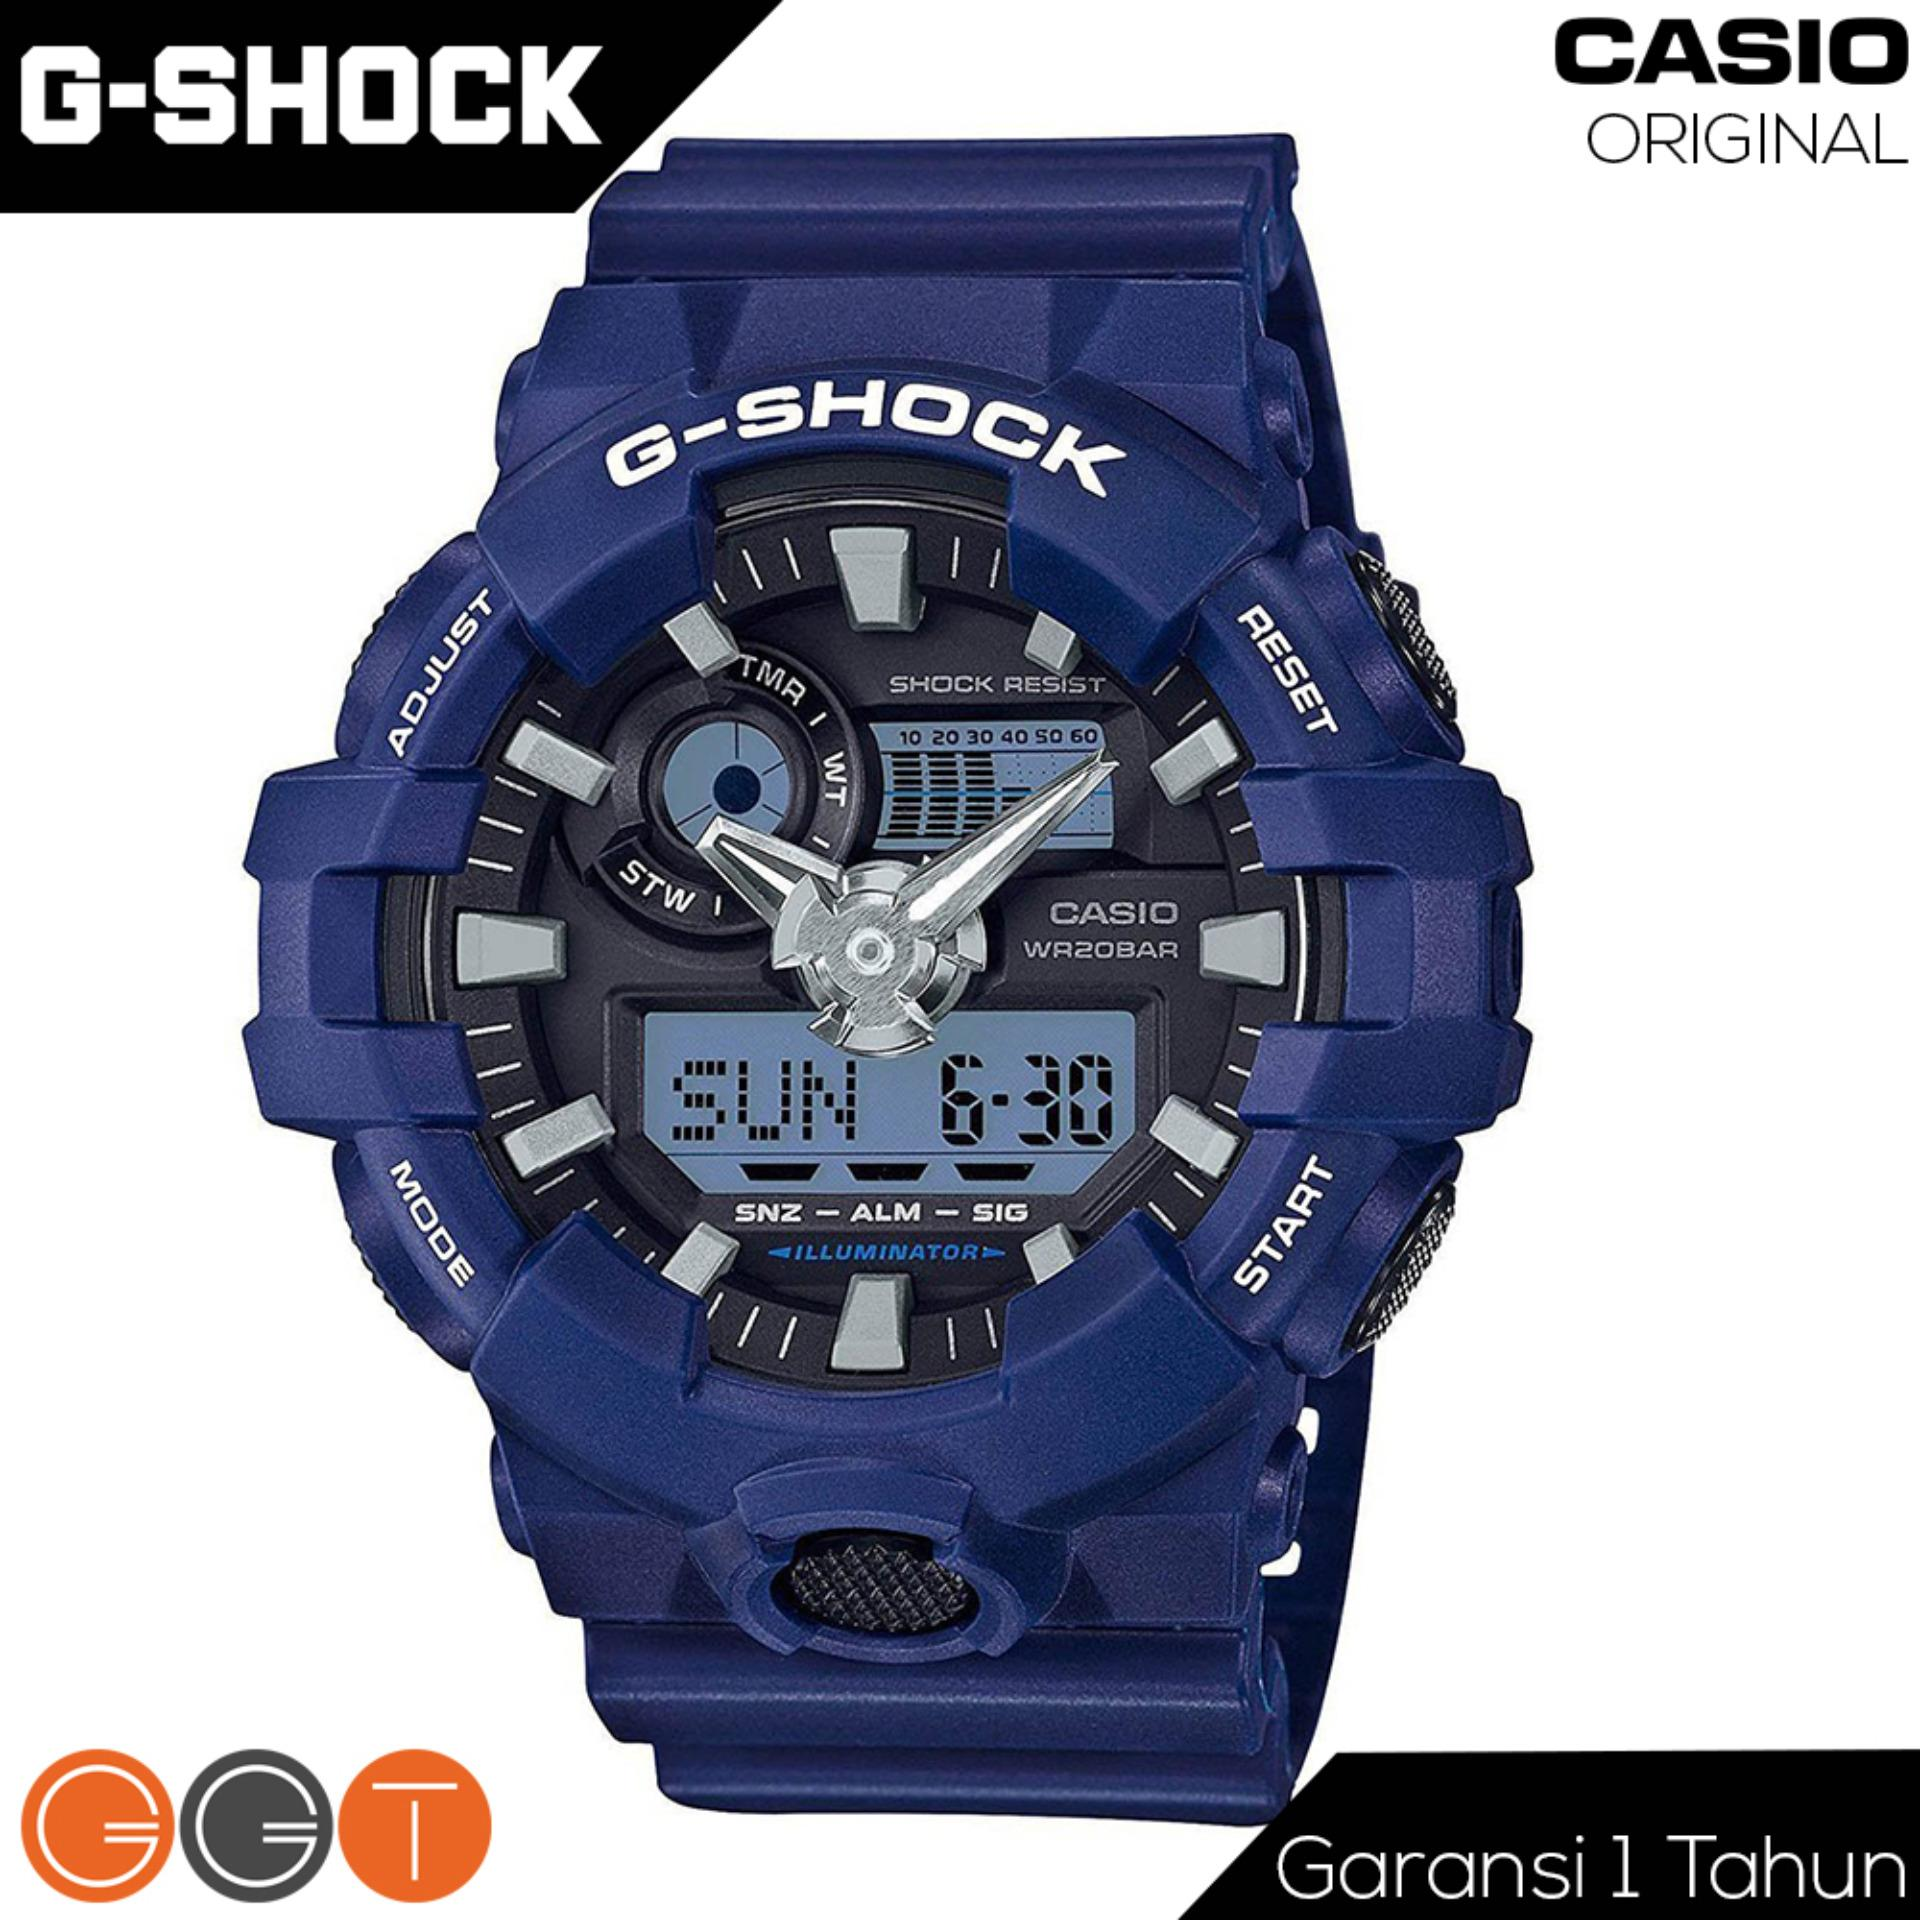 Diskon Casio G Shock Dual Time Resin Starp Quartz Movement Jam Tangan Pria Ga 700 2A Navy Blue Casio G Shock Di Jawa Timur